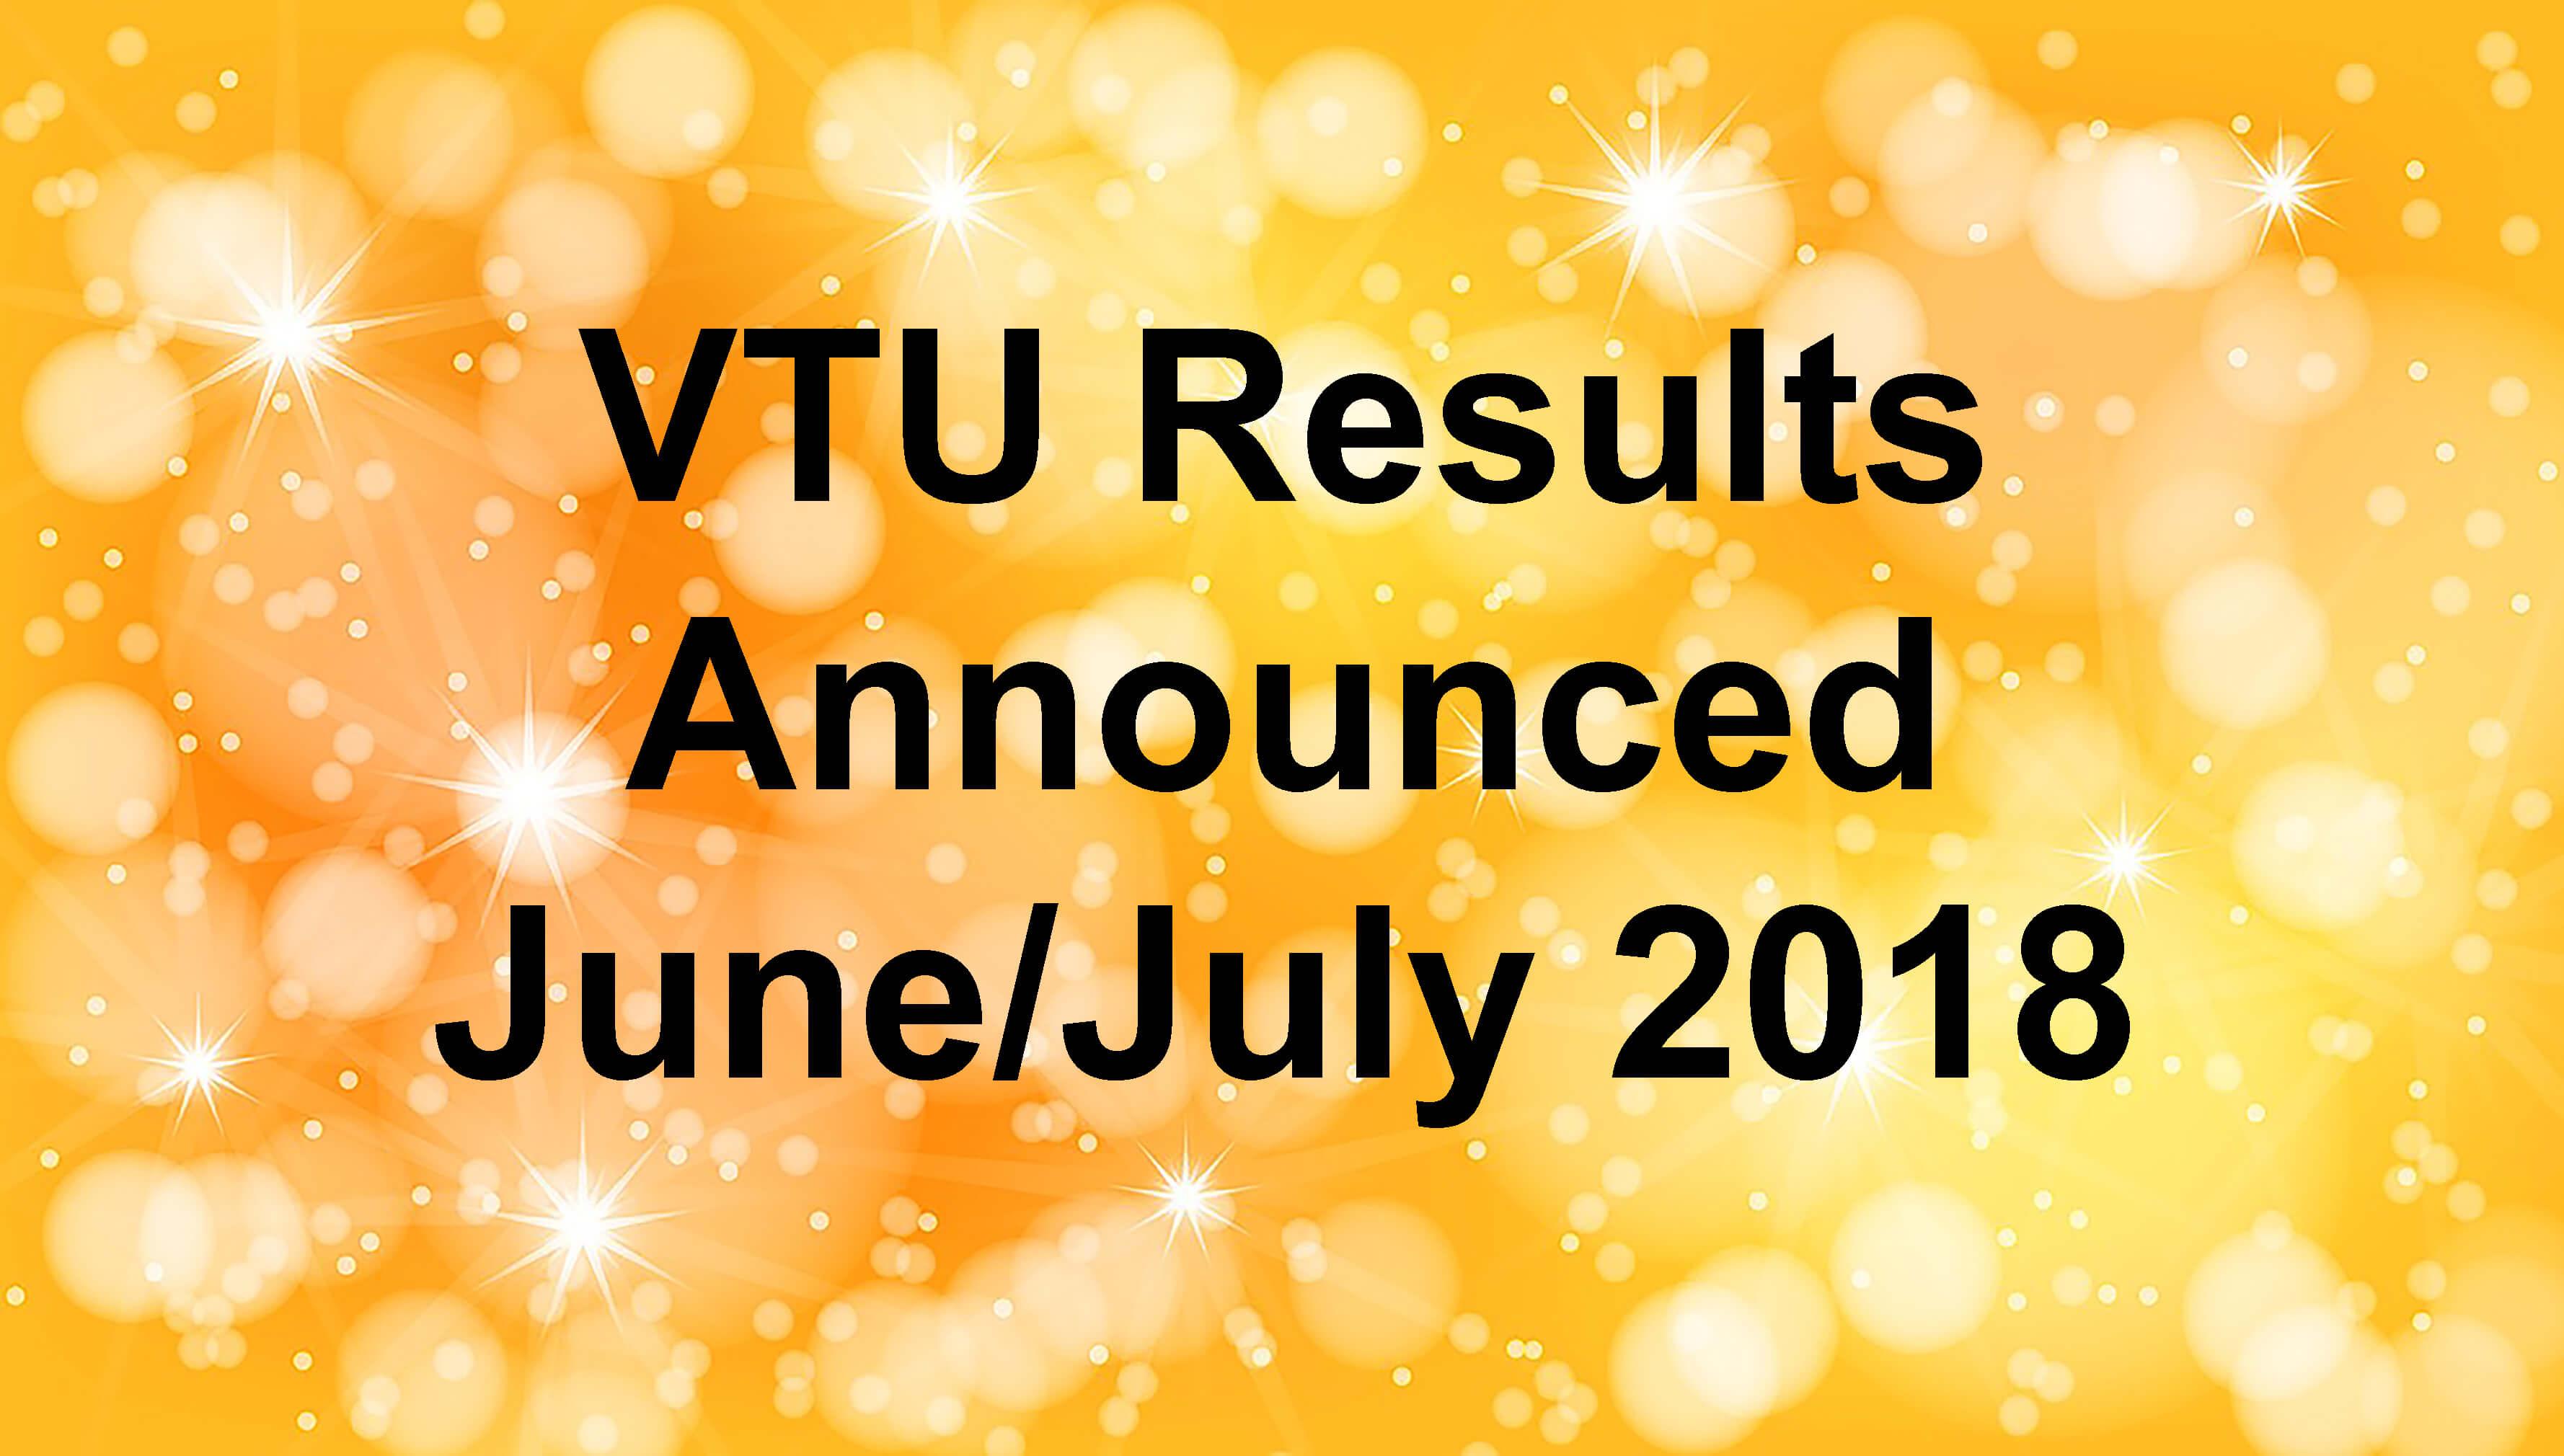 VTU June July 2018 Results Announced CBCS| NON-CBCS